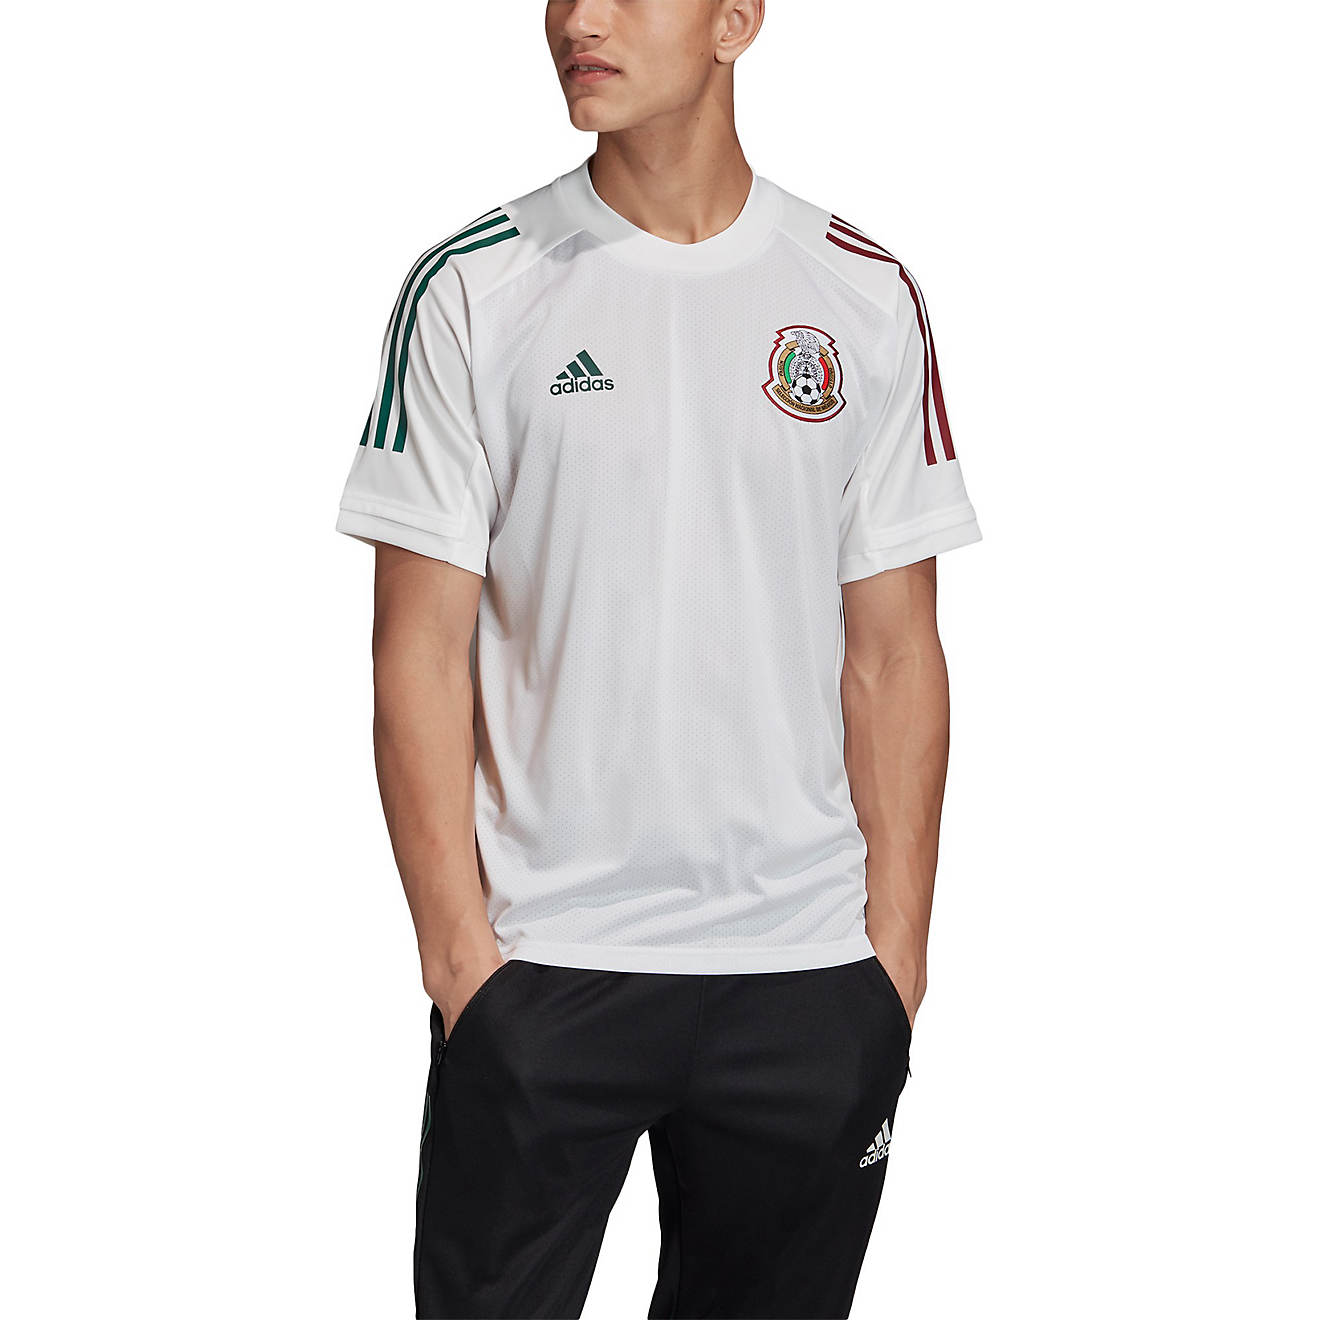 adidas Men's FMF Mexico Soccer Training Jersey | Academy